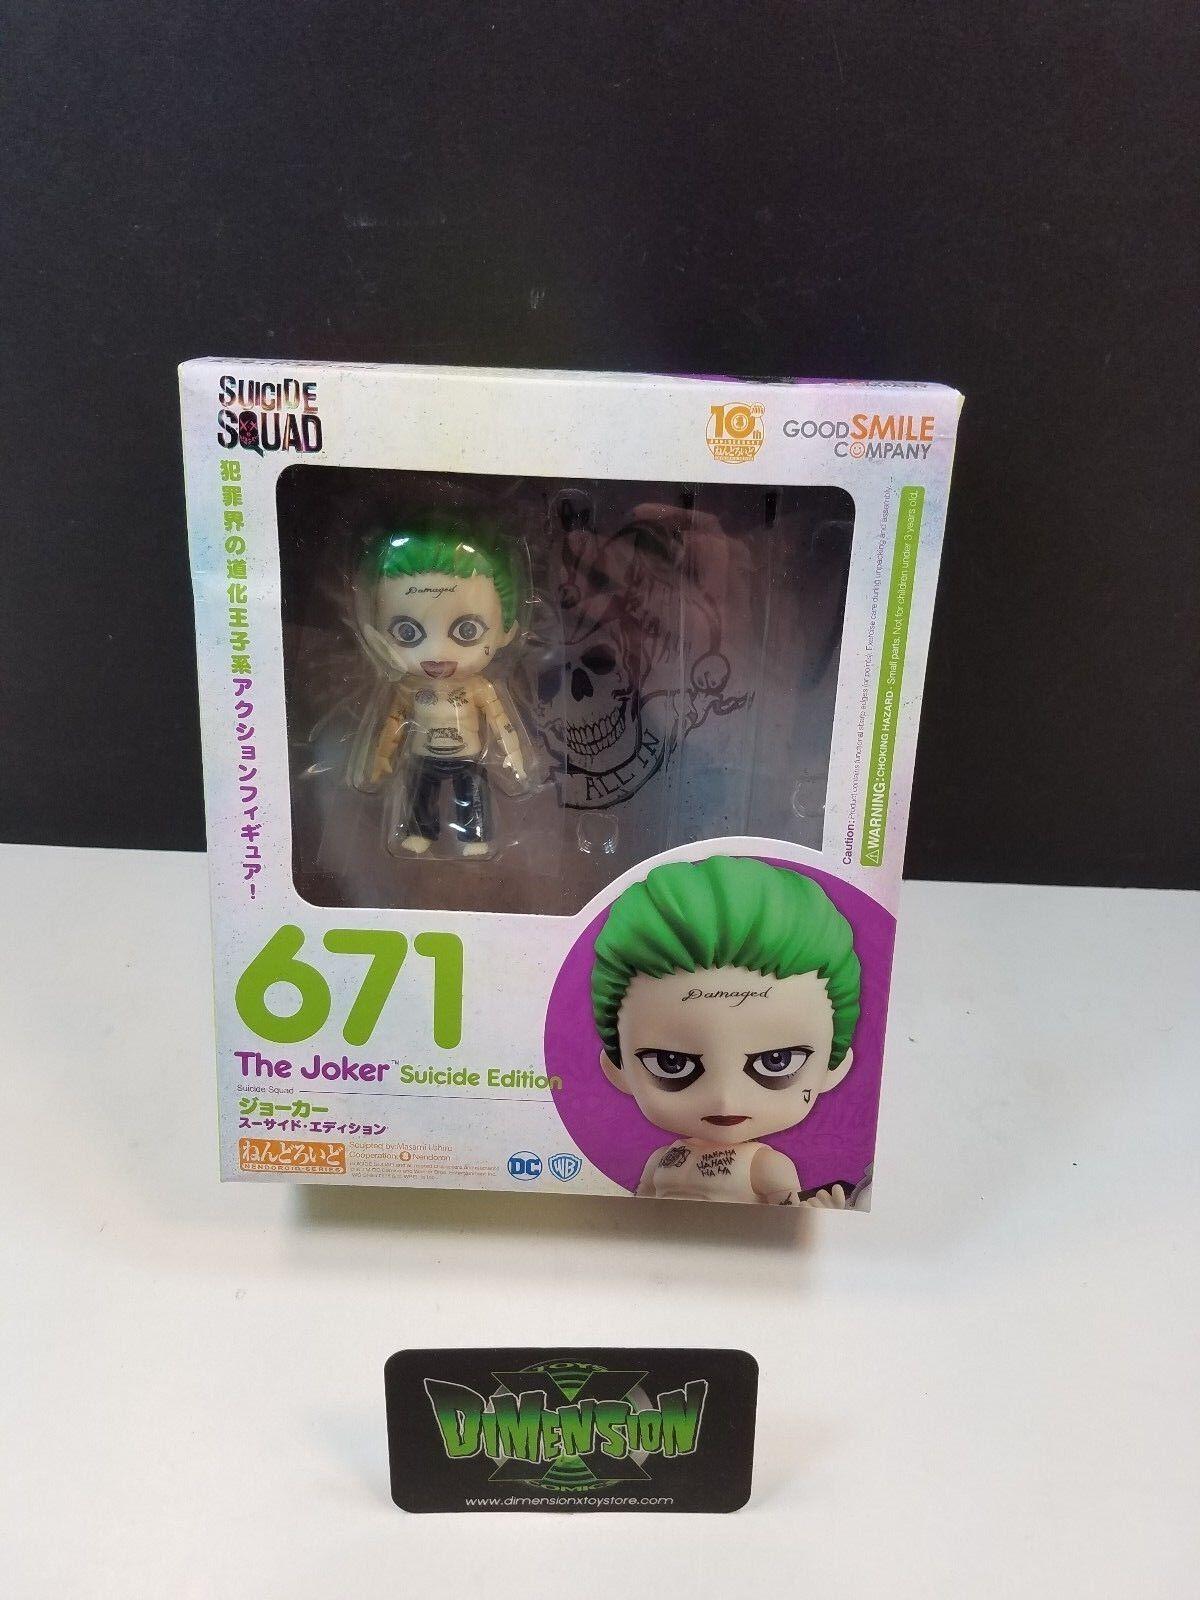 Good Smile Company Nendoroid Suicide Squad - The Joker Figure MIB